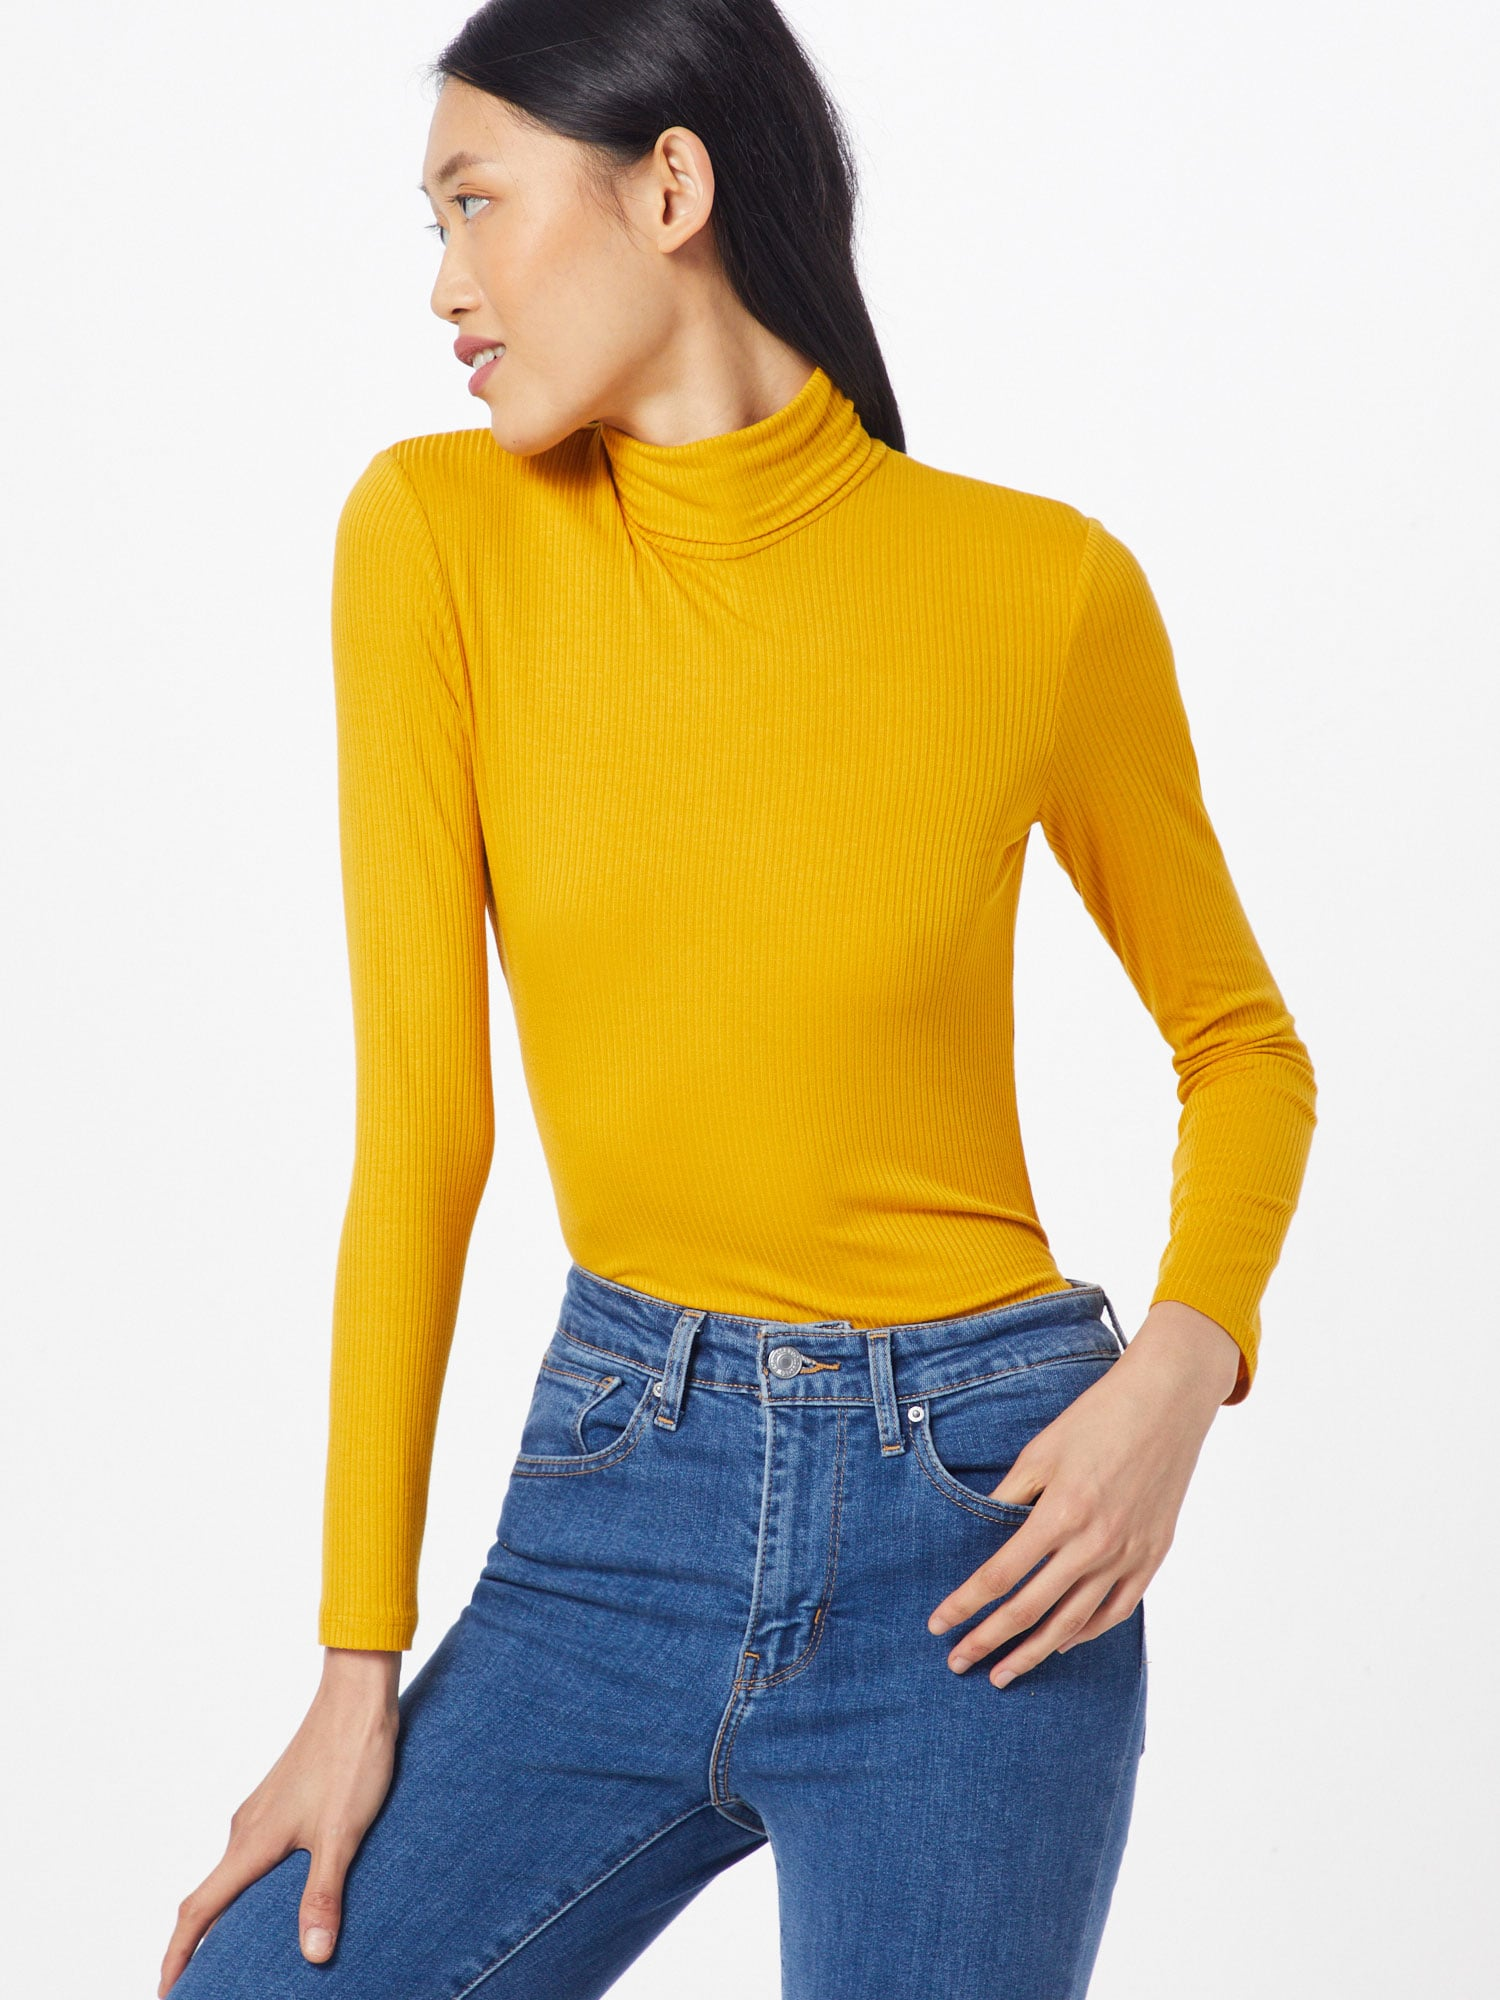 united colors of benetton - Shirt 'TURTLE NECK SW. L/S'